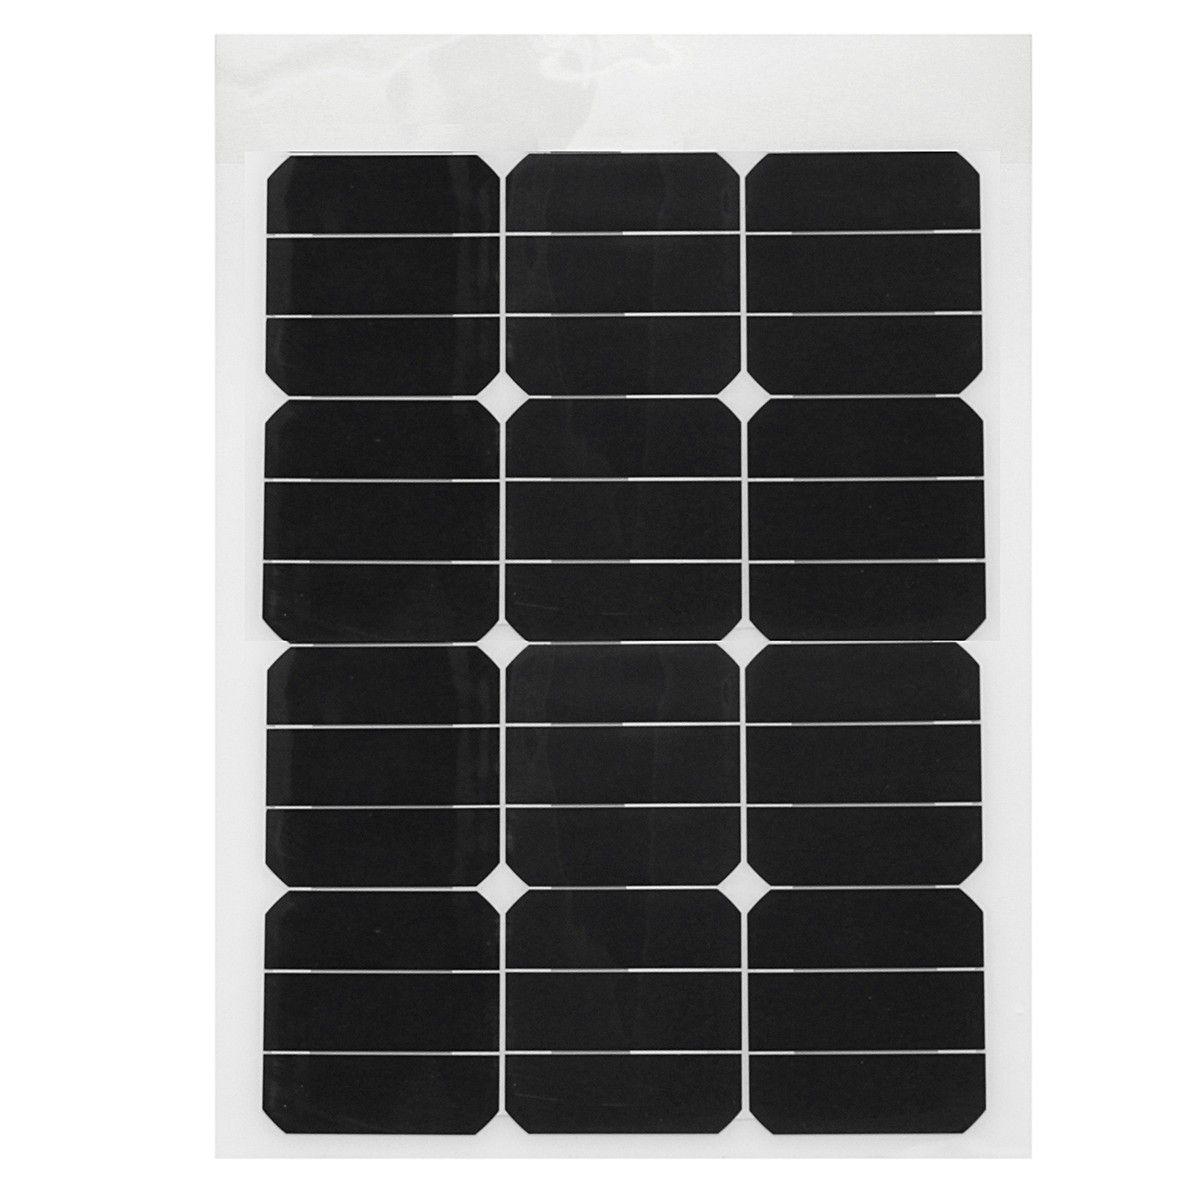 Scm Solar elfelandâ 40w 18v mono semi solar panel for home rv boat